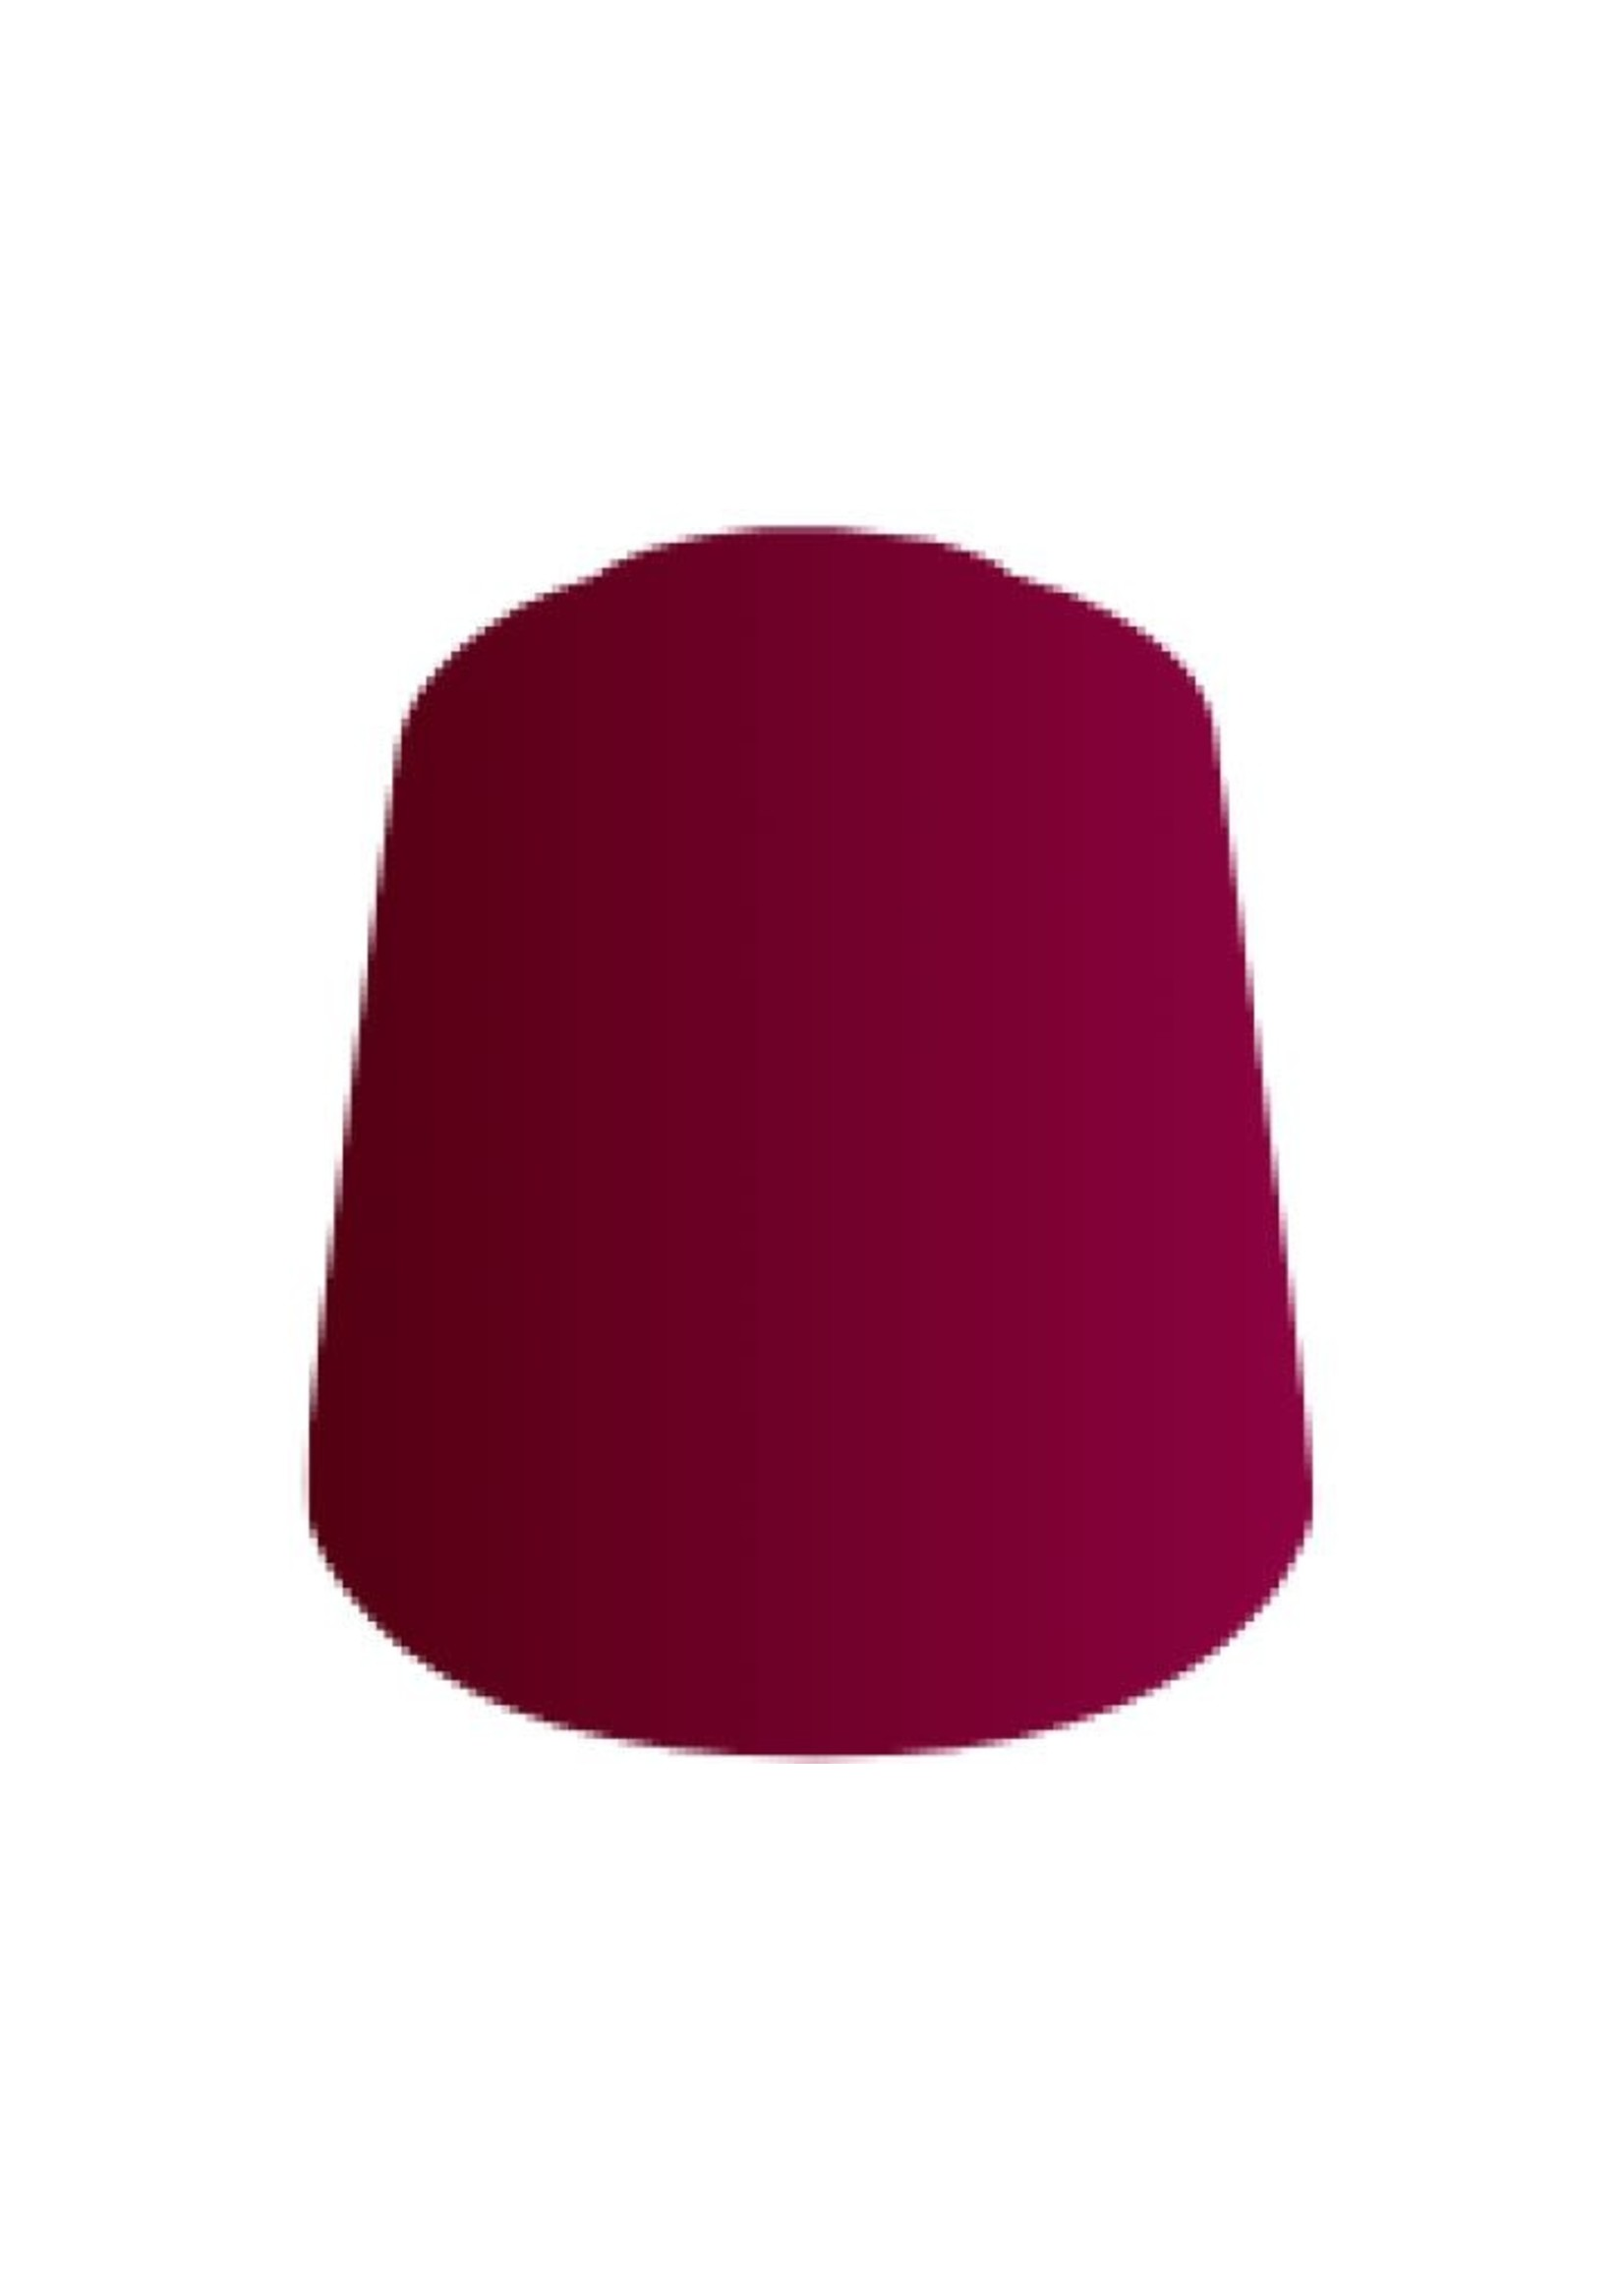 Contrast: Volupus Pink (18Ml)